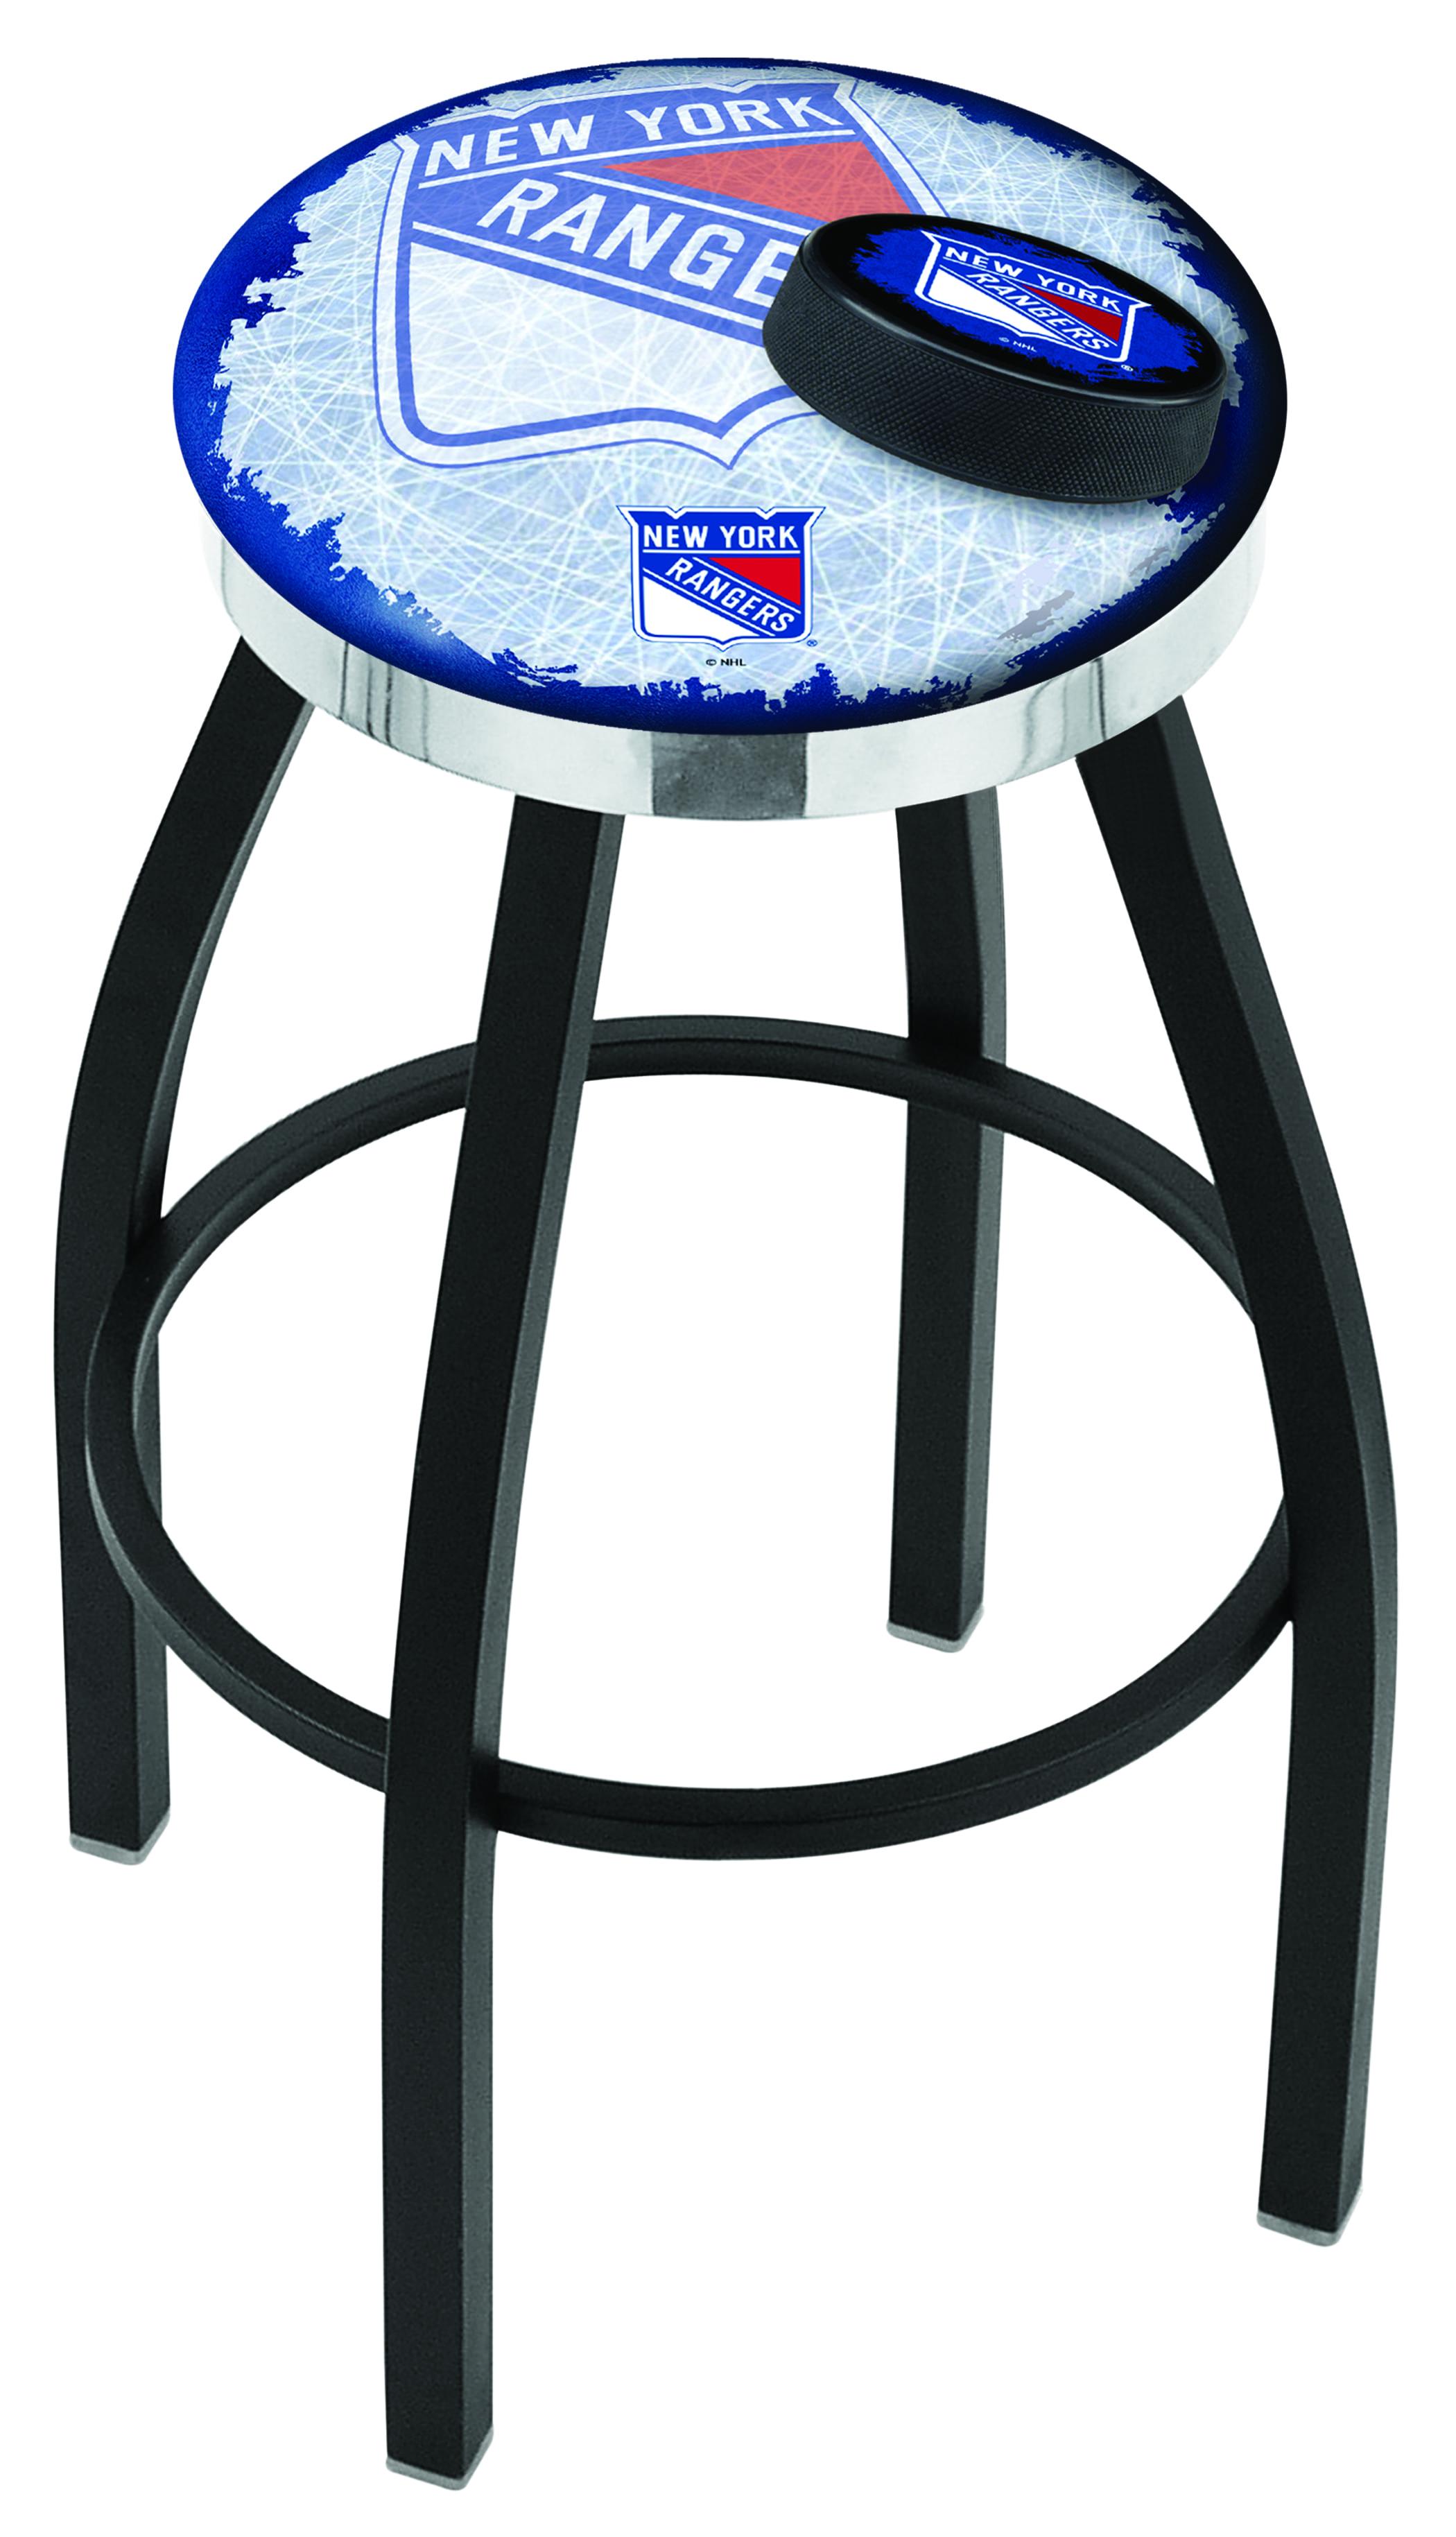 New York Rangers Counter Height Bar Stool w Official NHL  : L8B2CNYRang D2 from www.familyleisure.com size 2100 x 3659 jpeg 1172kB